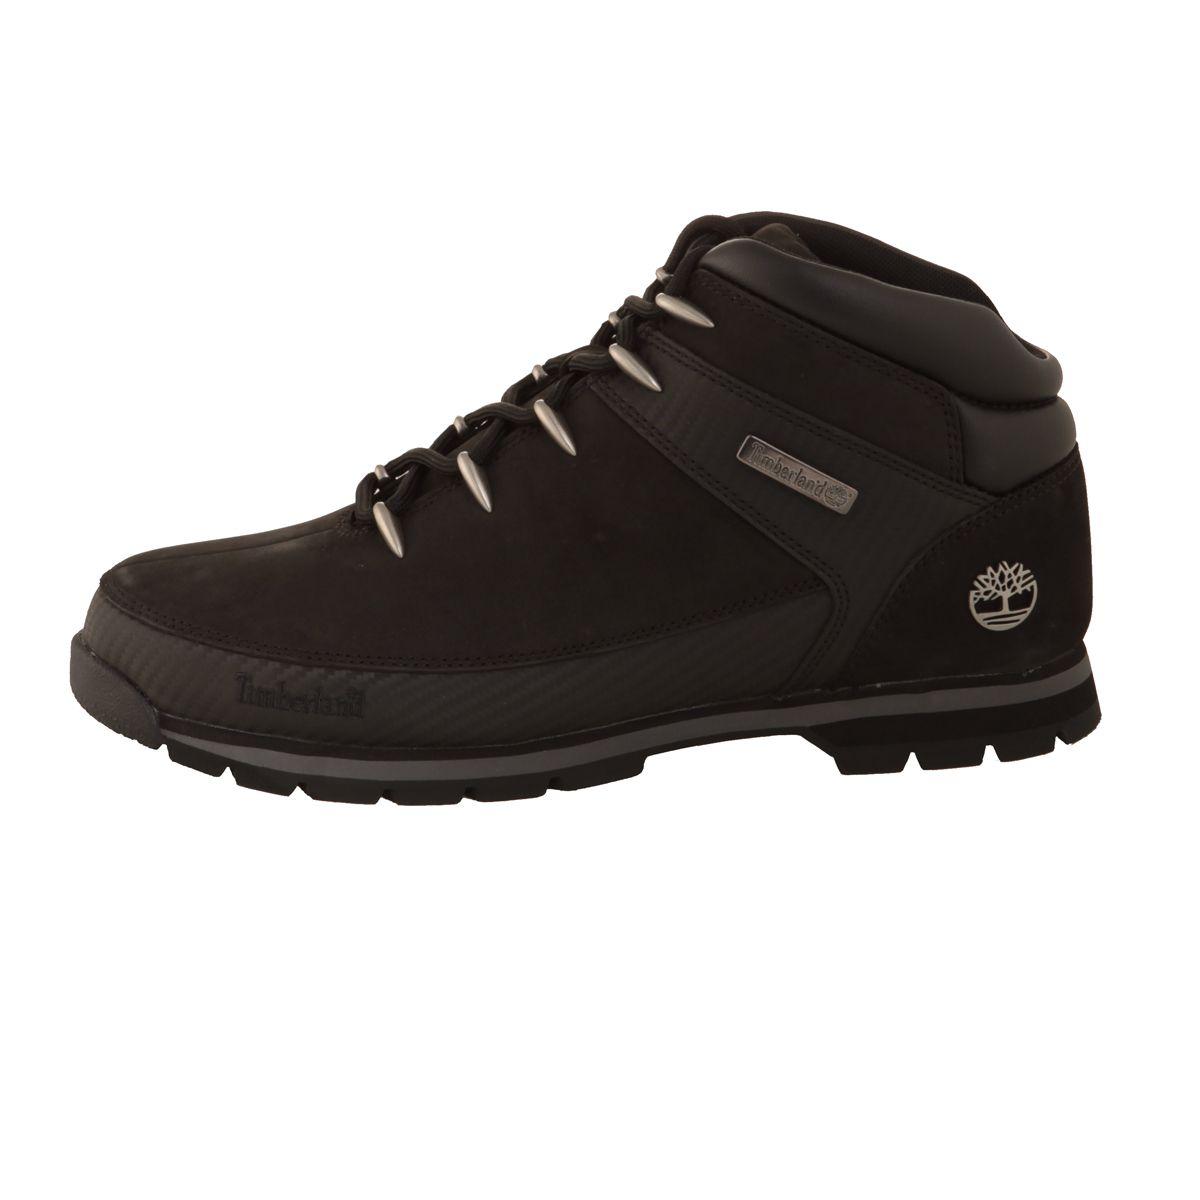 chaussures euro sprint noires grande taille du 46 au 50. Black Bedroom Furniture Sets. Home Design Ideas